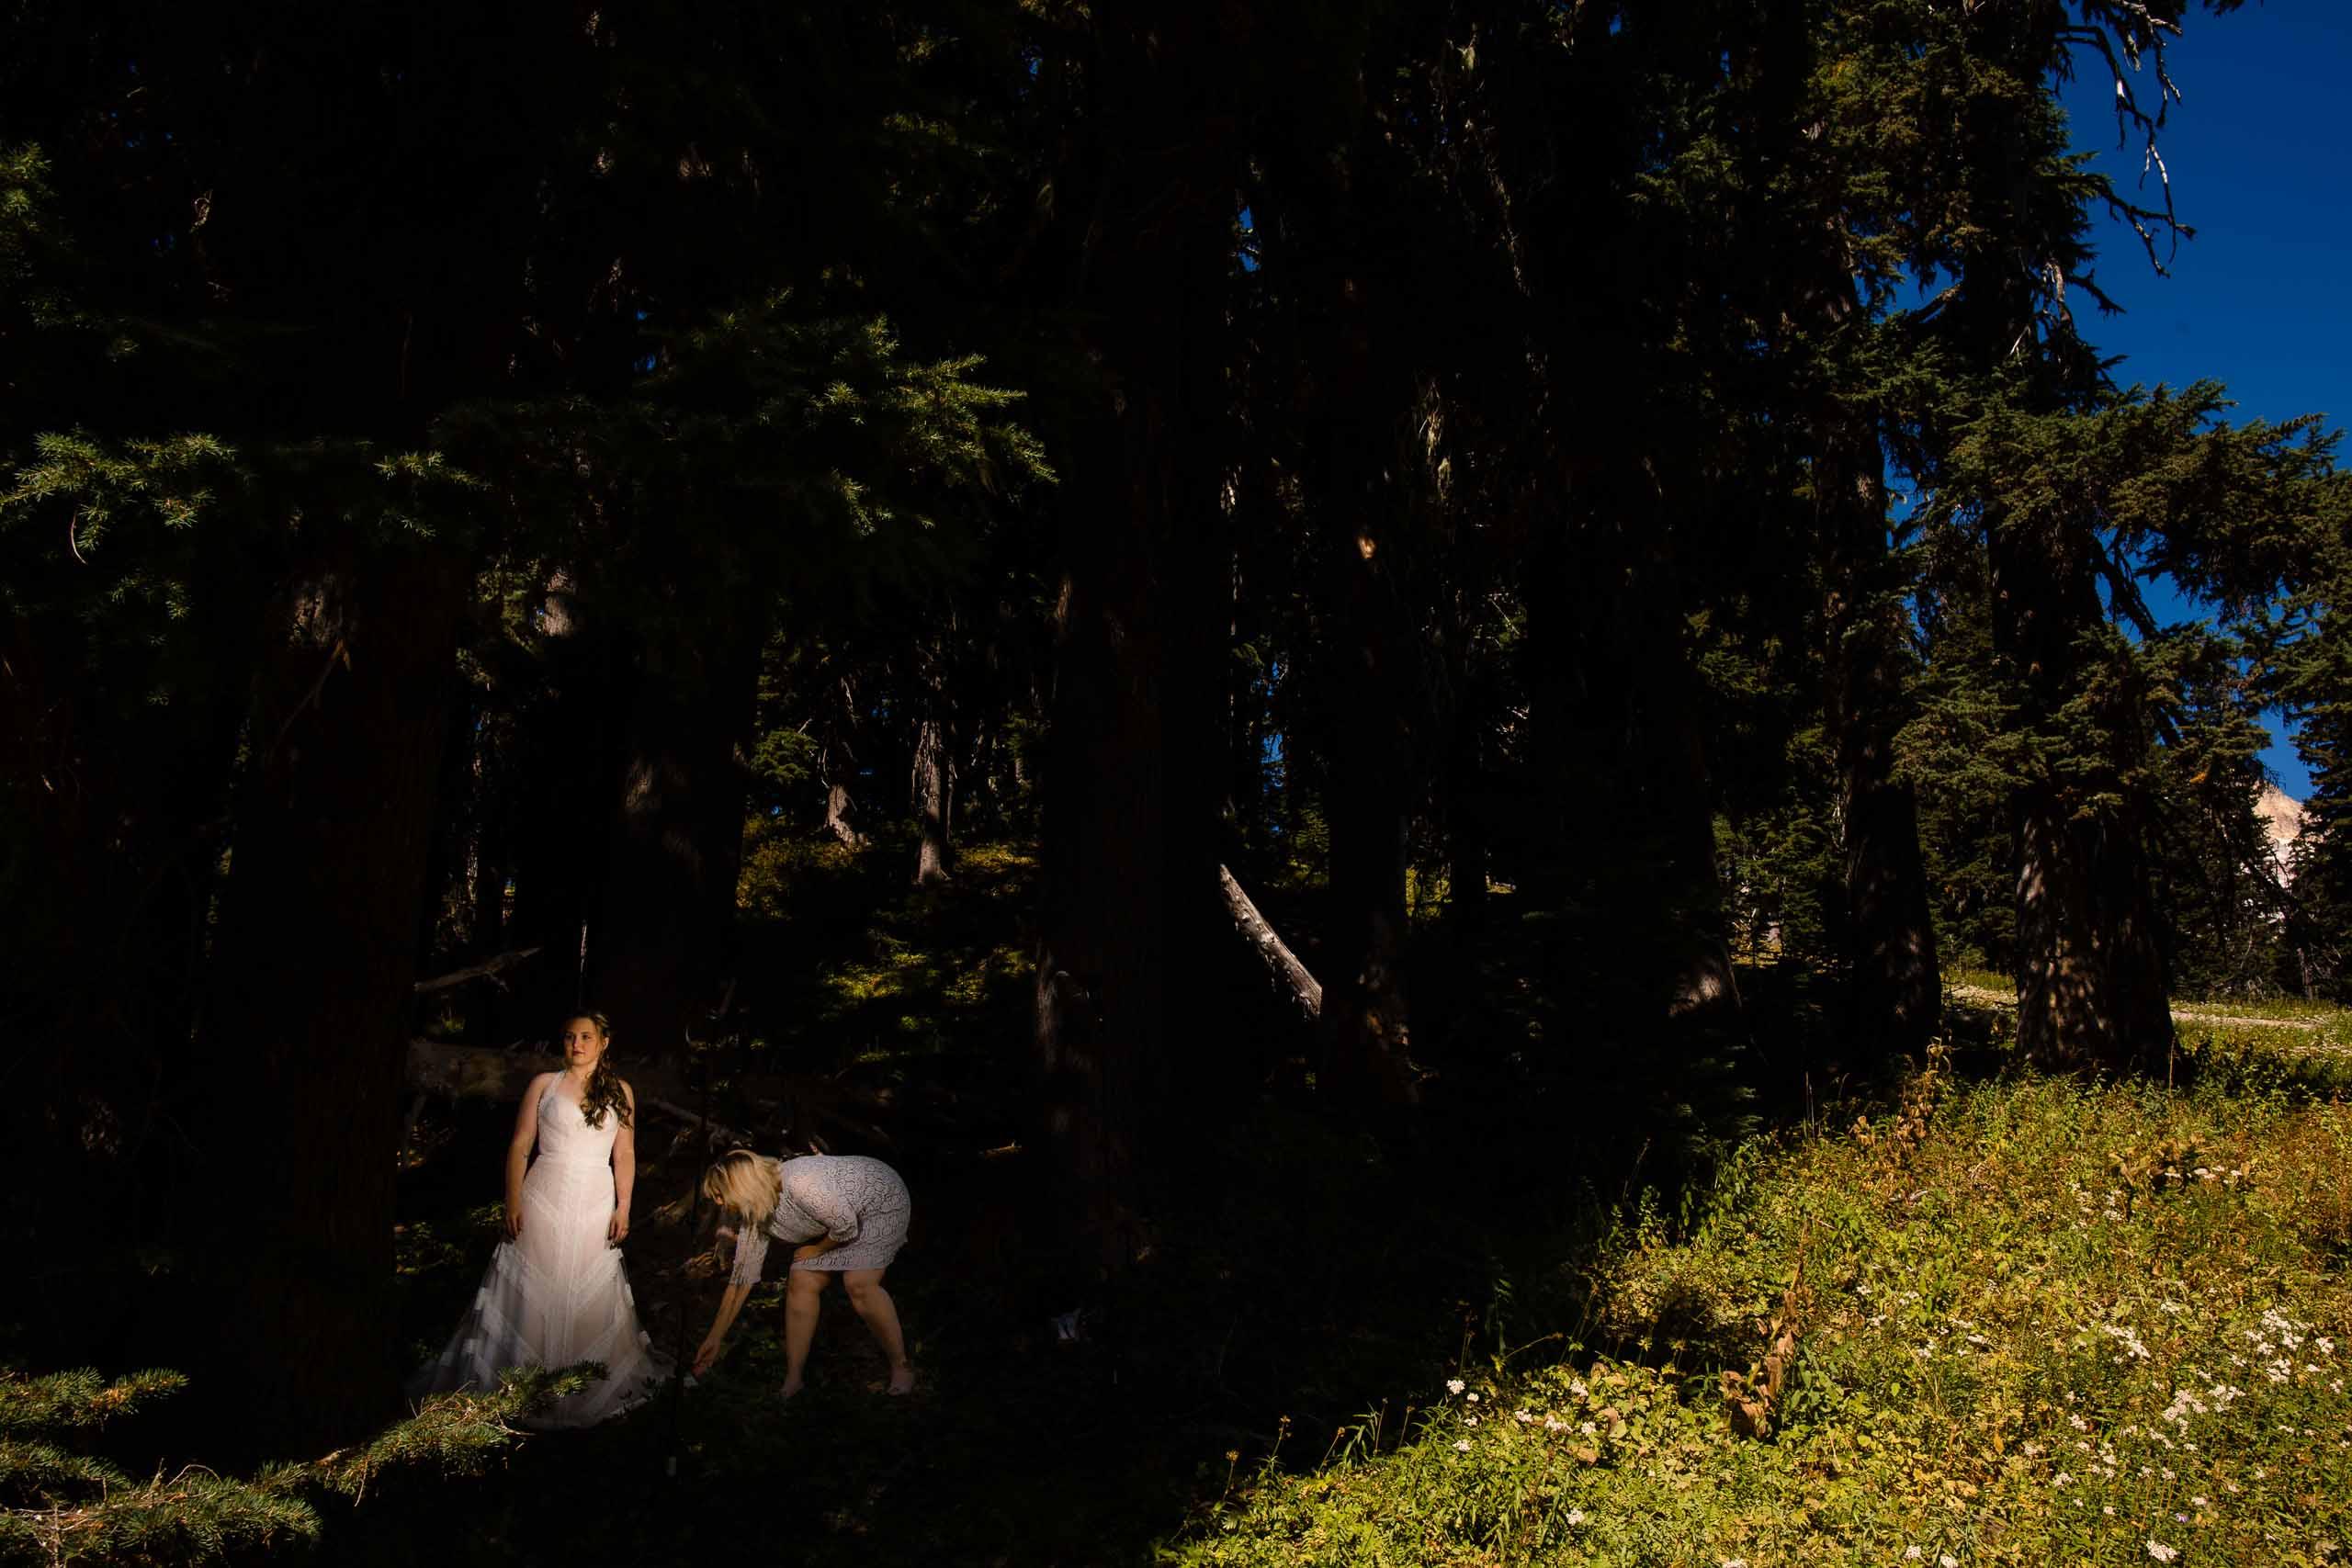 Bride getting ready for her Mt Hood Meadows wedding at Umbrella Falls